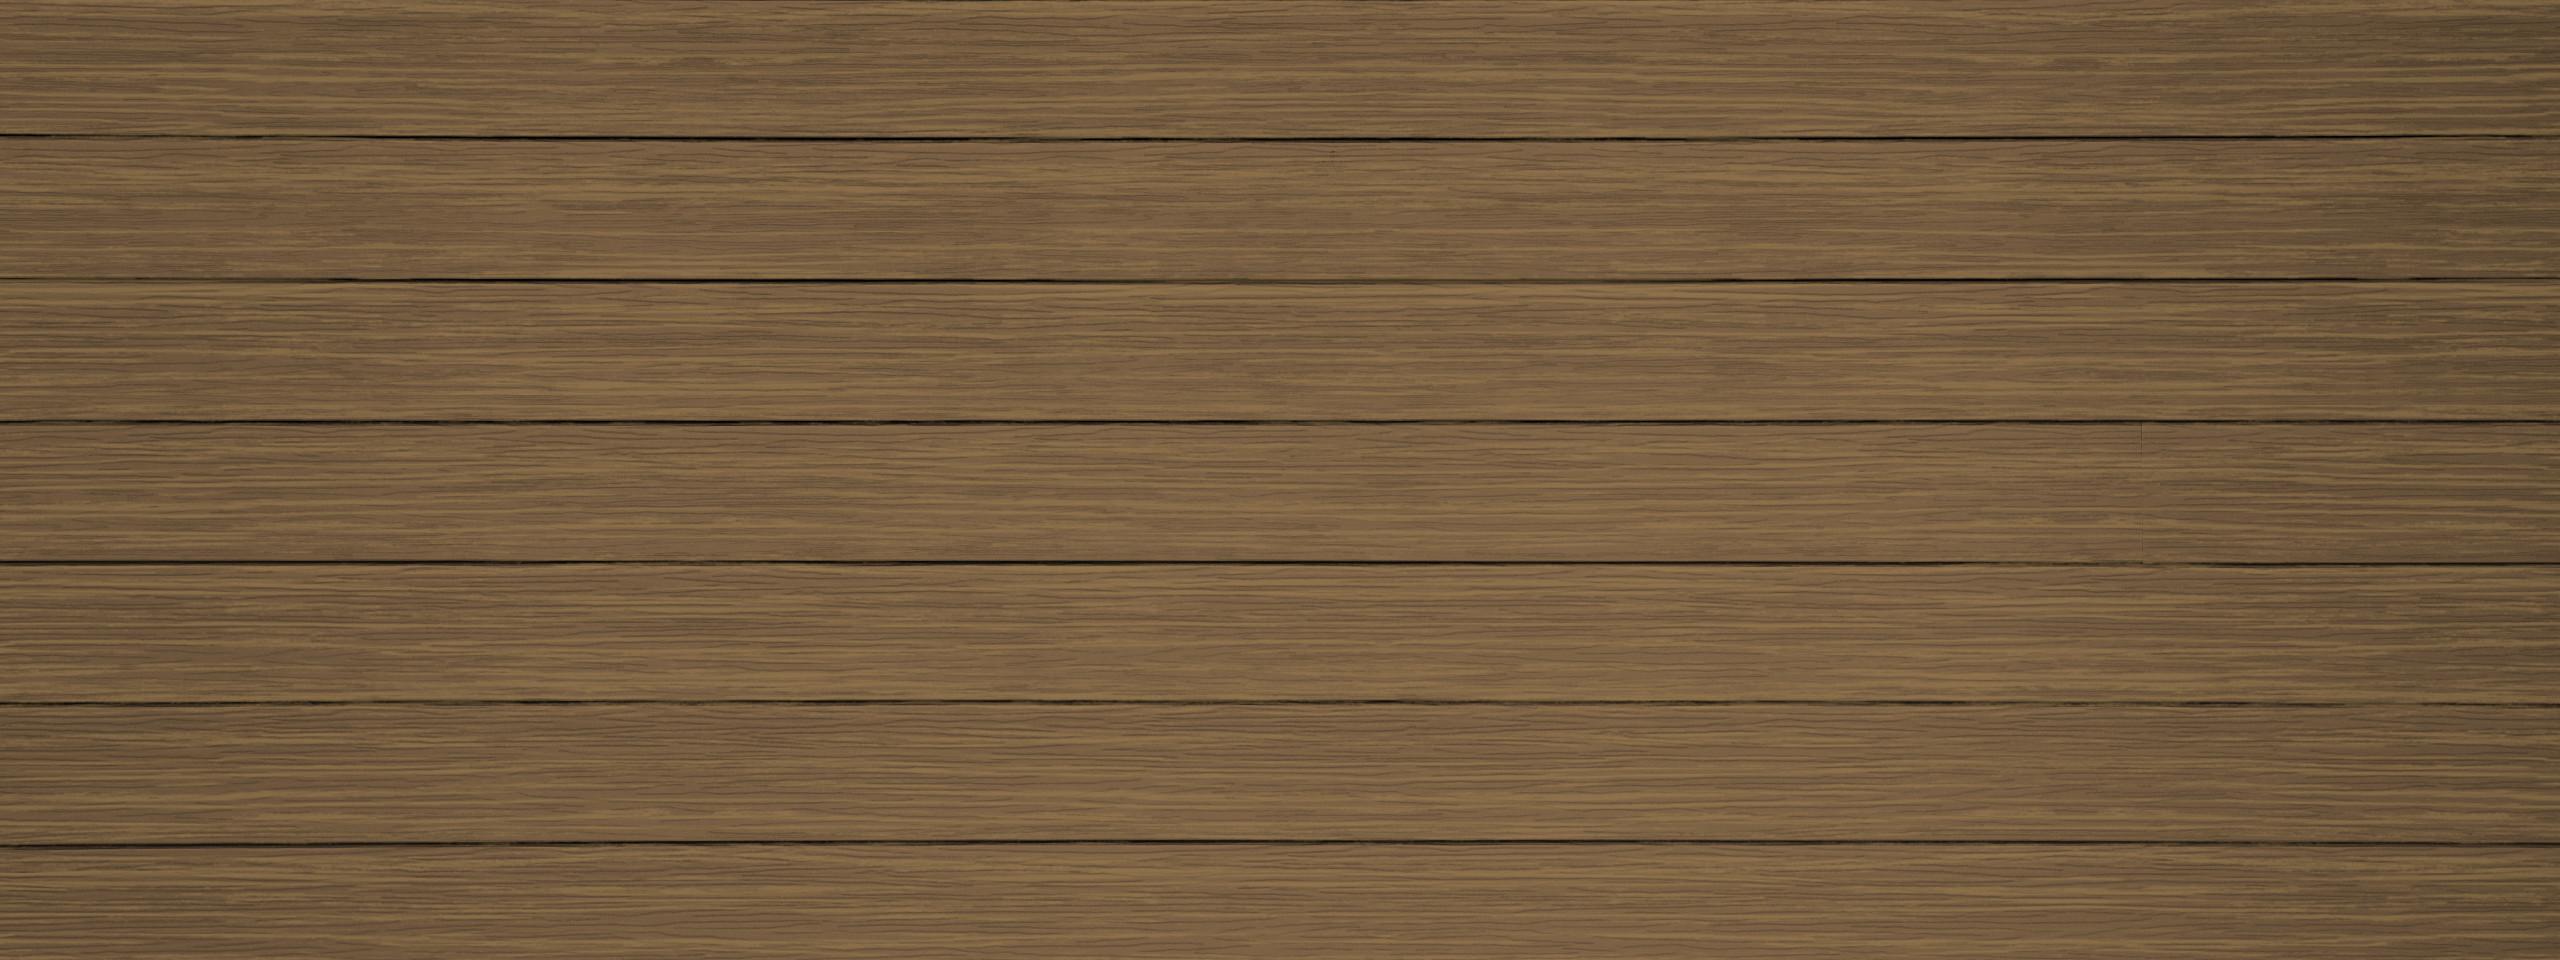 Entex traditional lap cedarwood hd horizontal steel siding